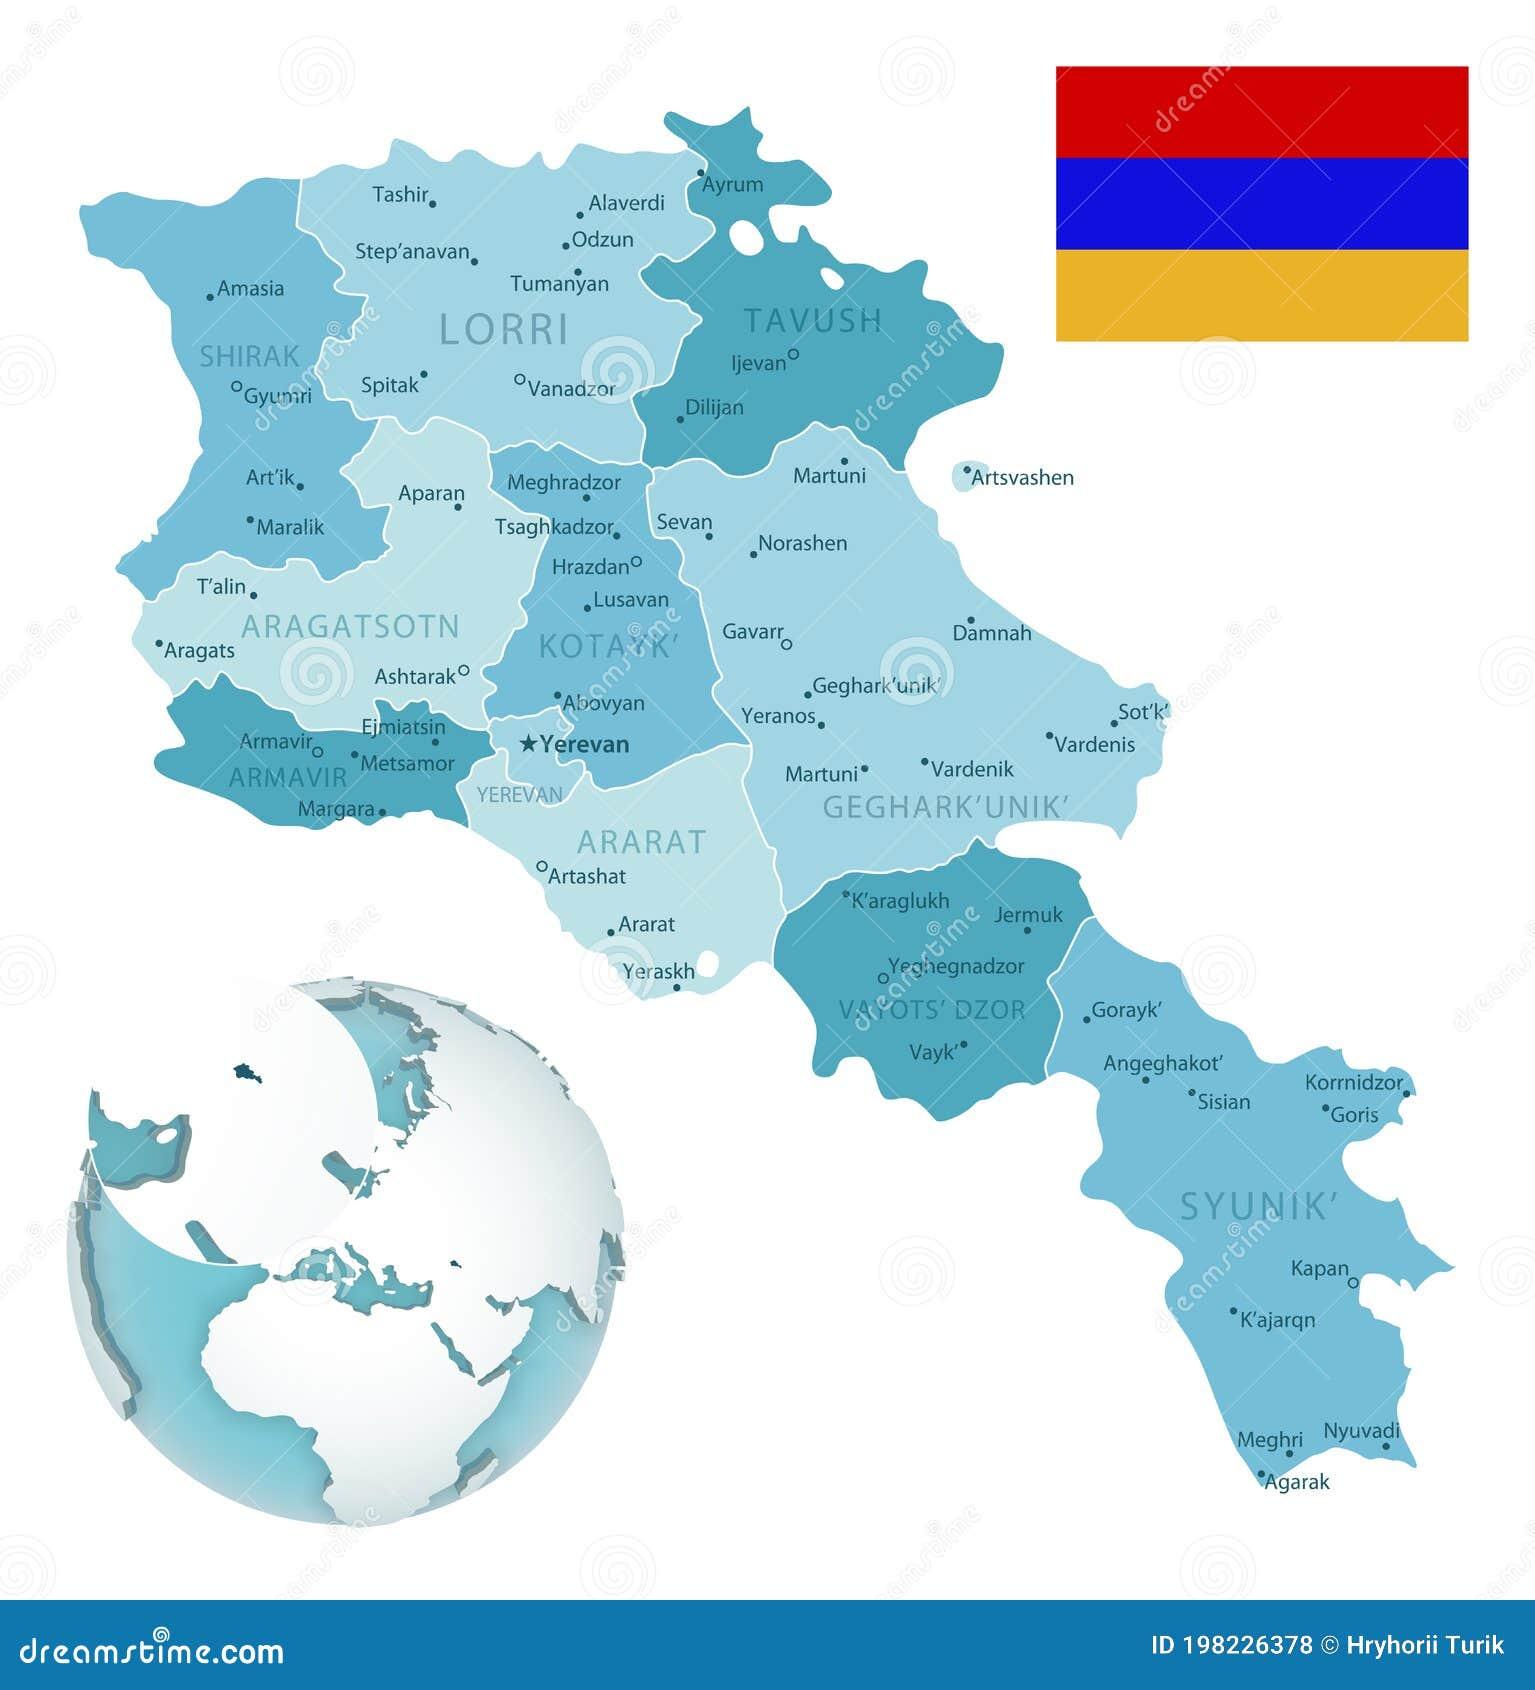 Armenia Provinces Map Stock Illustrations 64 Armenia Provinces Map Stock Illustrations Vectors Clipart Dreamstime